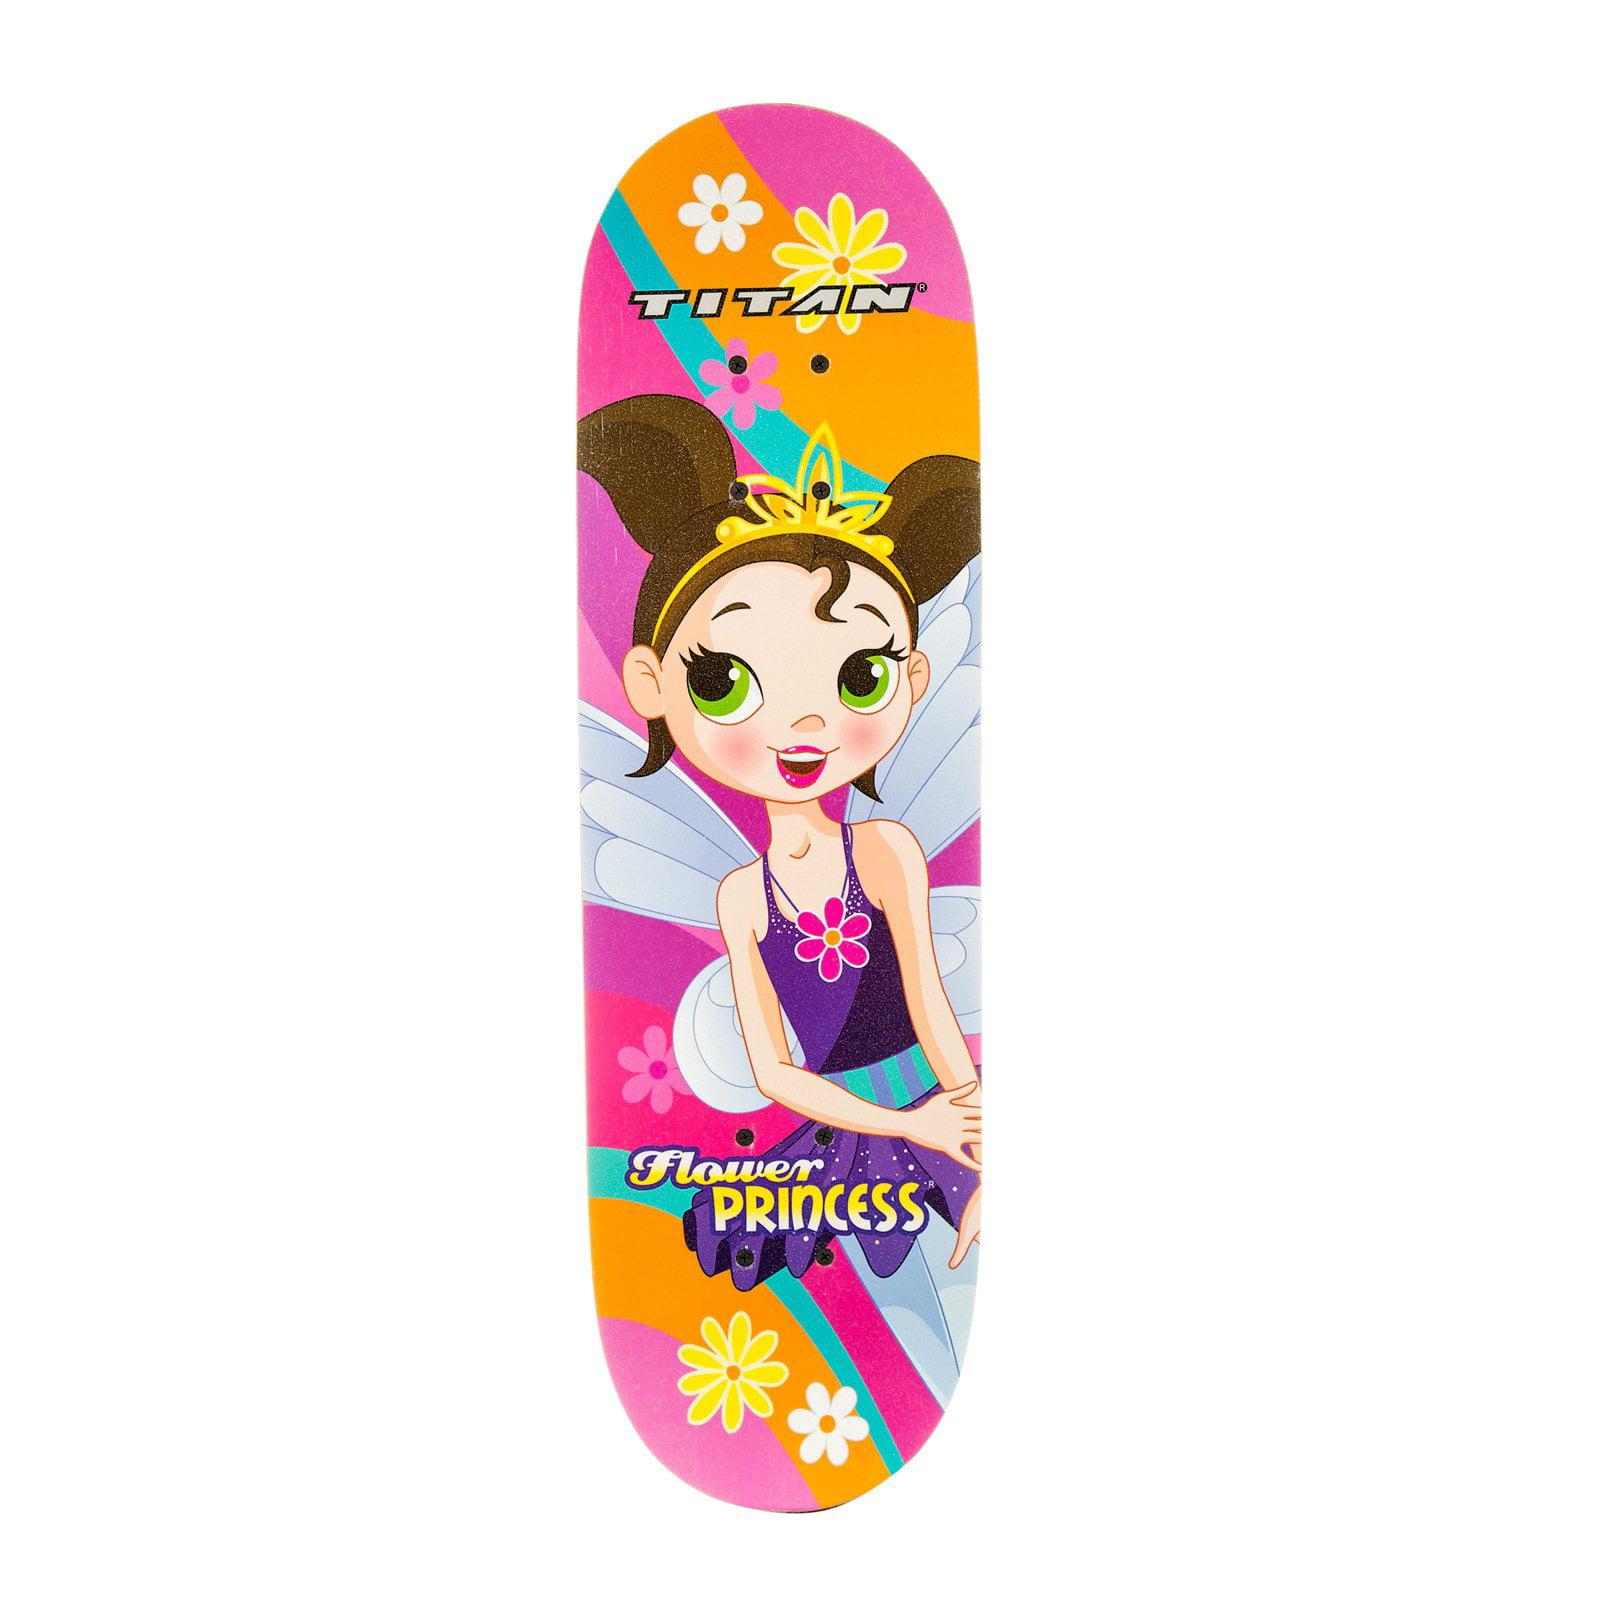 Titan Flower Princess Girls' Complete Skateboard